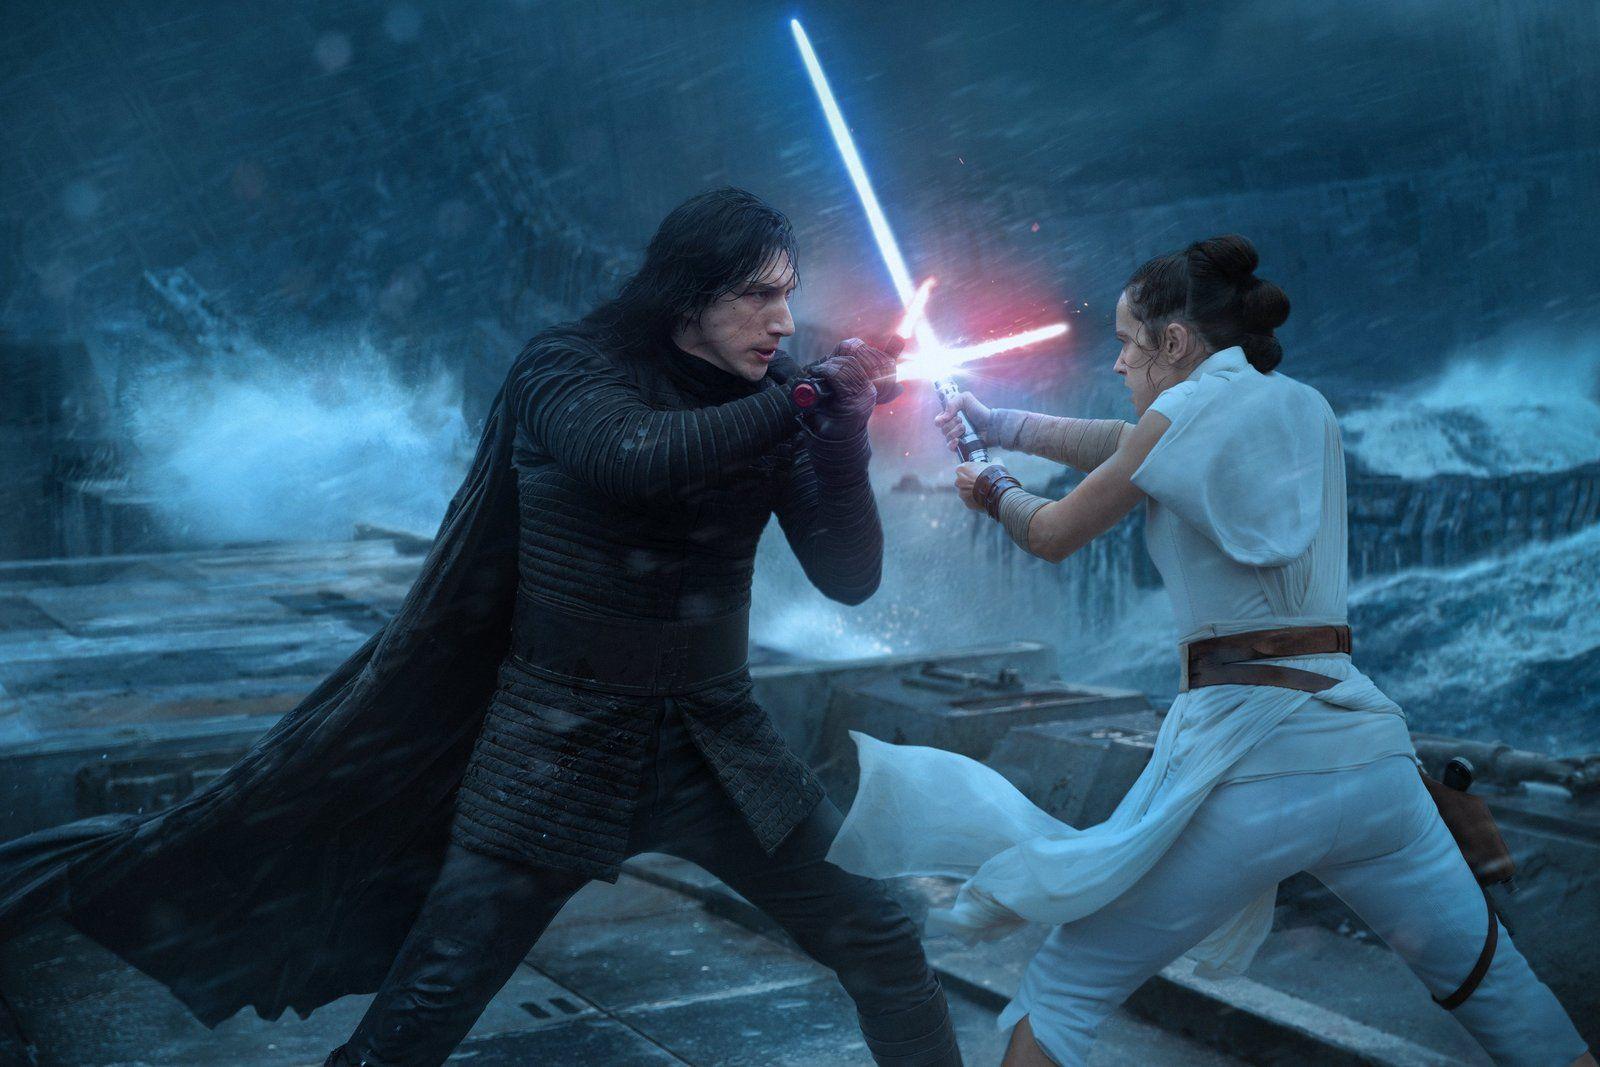 Star Wars Retcons Sith Rule Of Two In New Rise Of Skywalker Novel Gamesradar